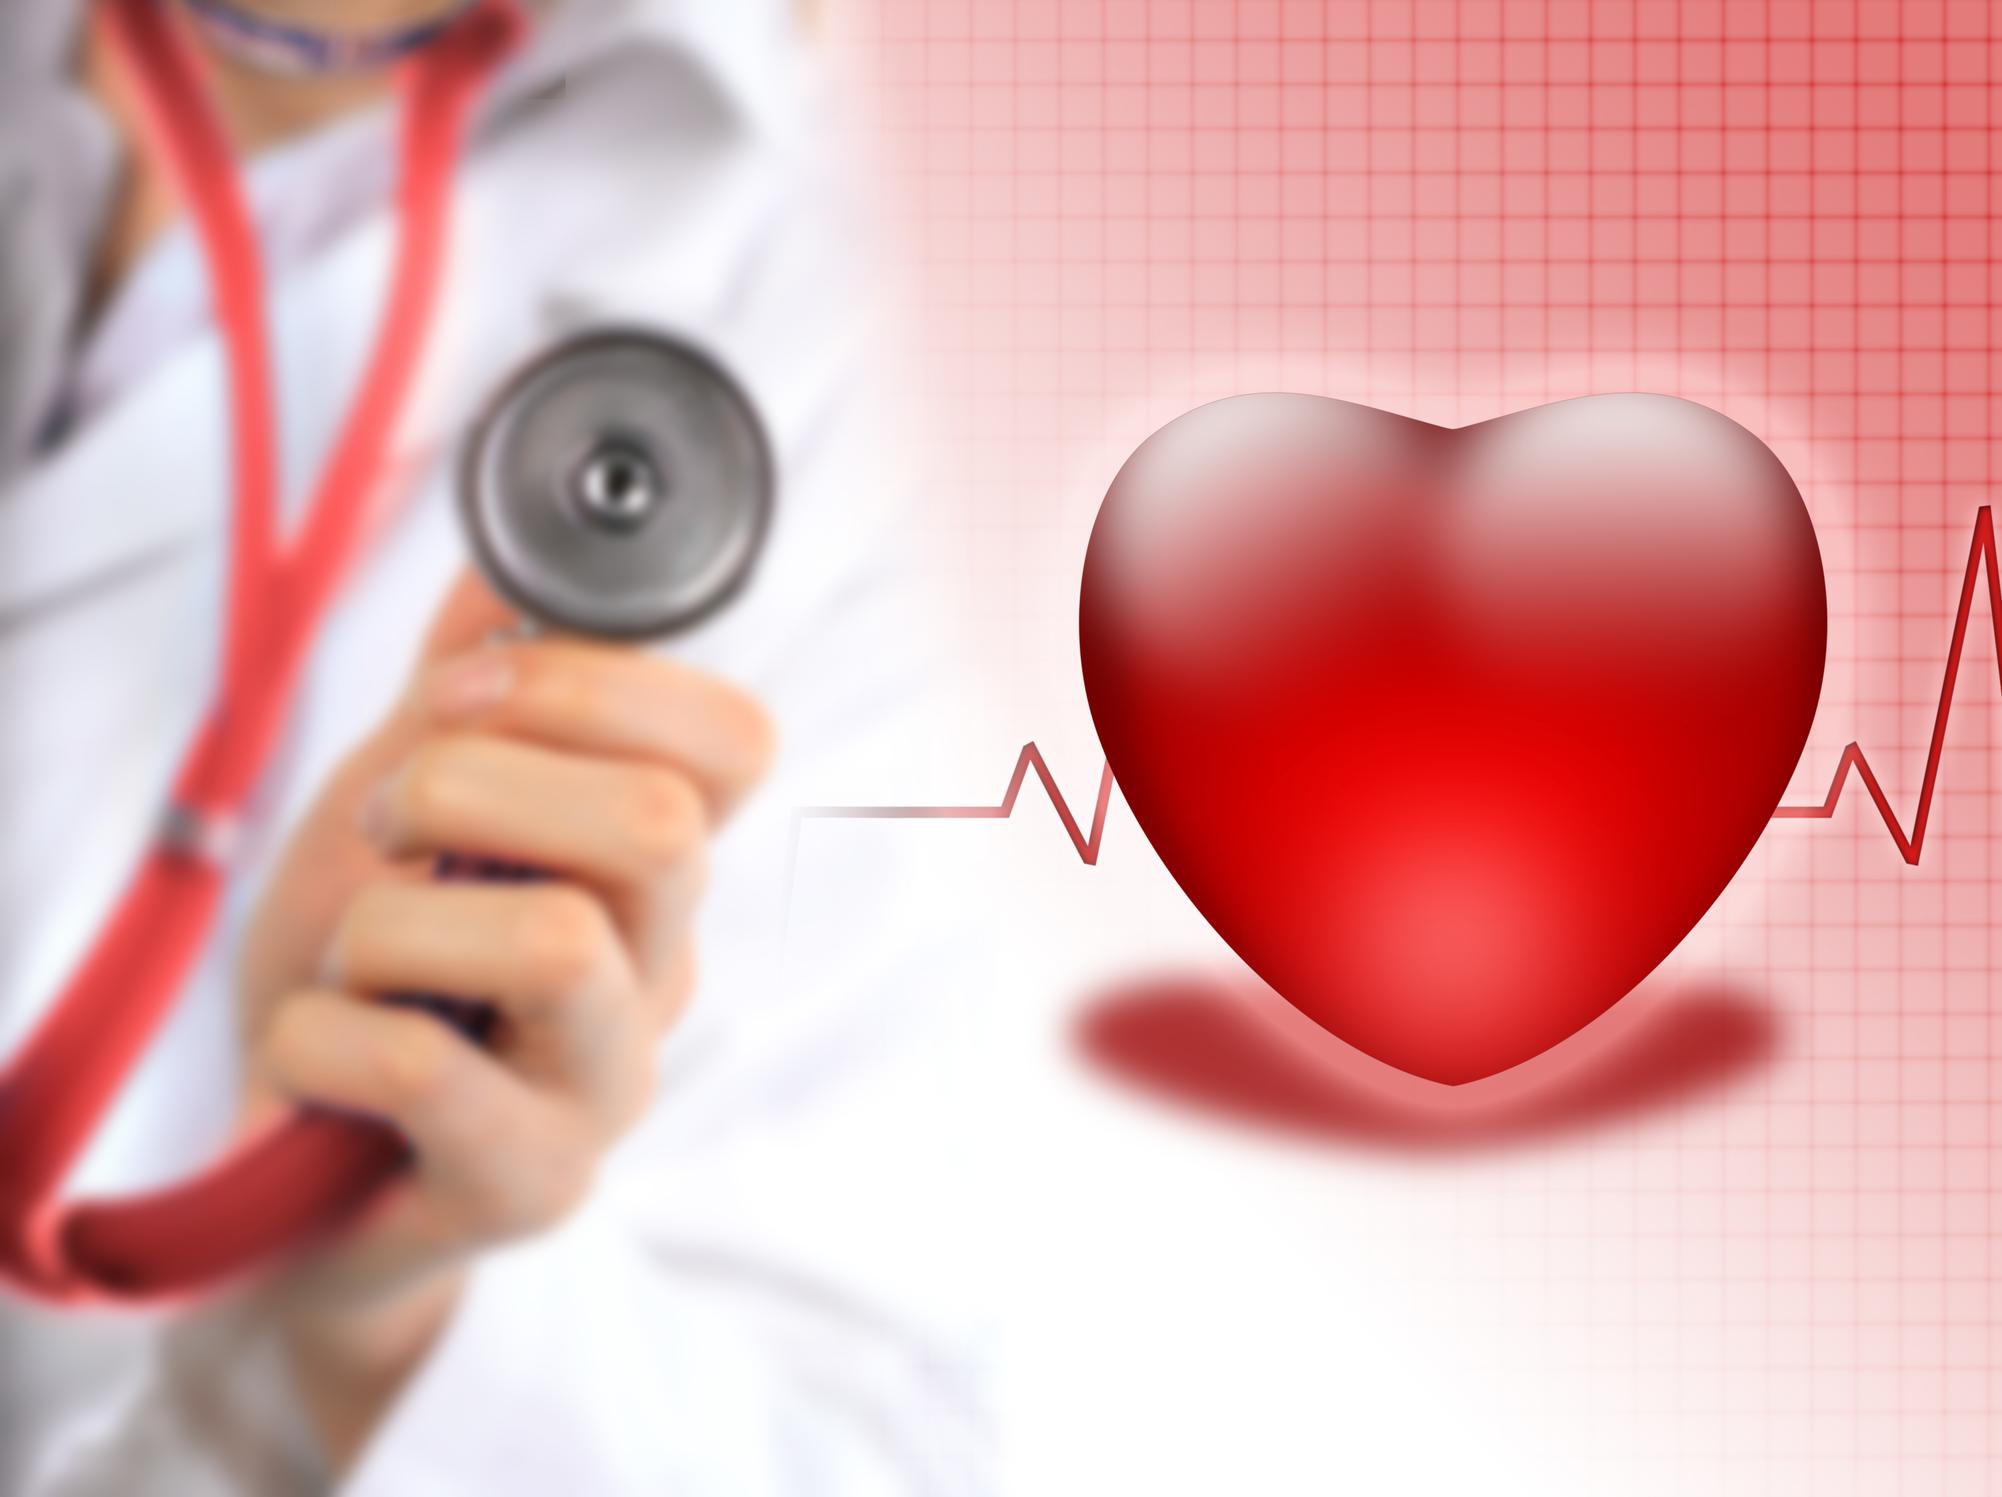 Lege med stetoskop og hjerte med EKG-graf